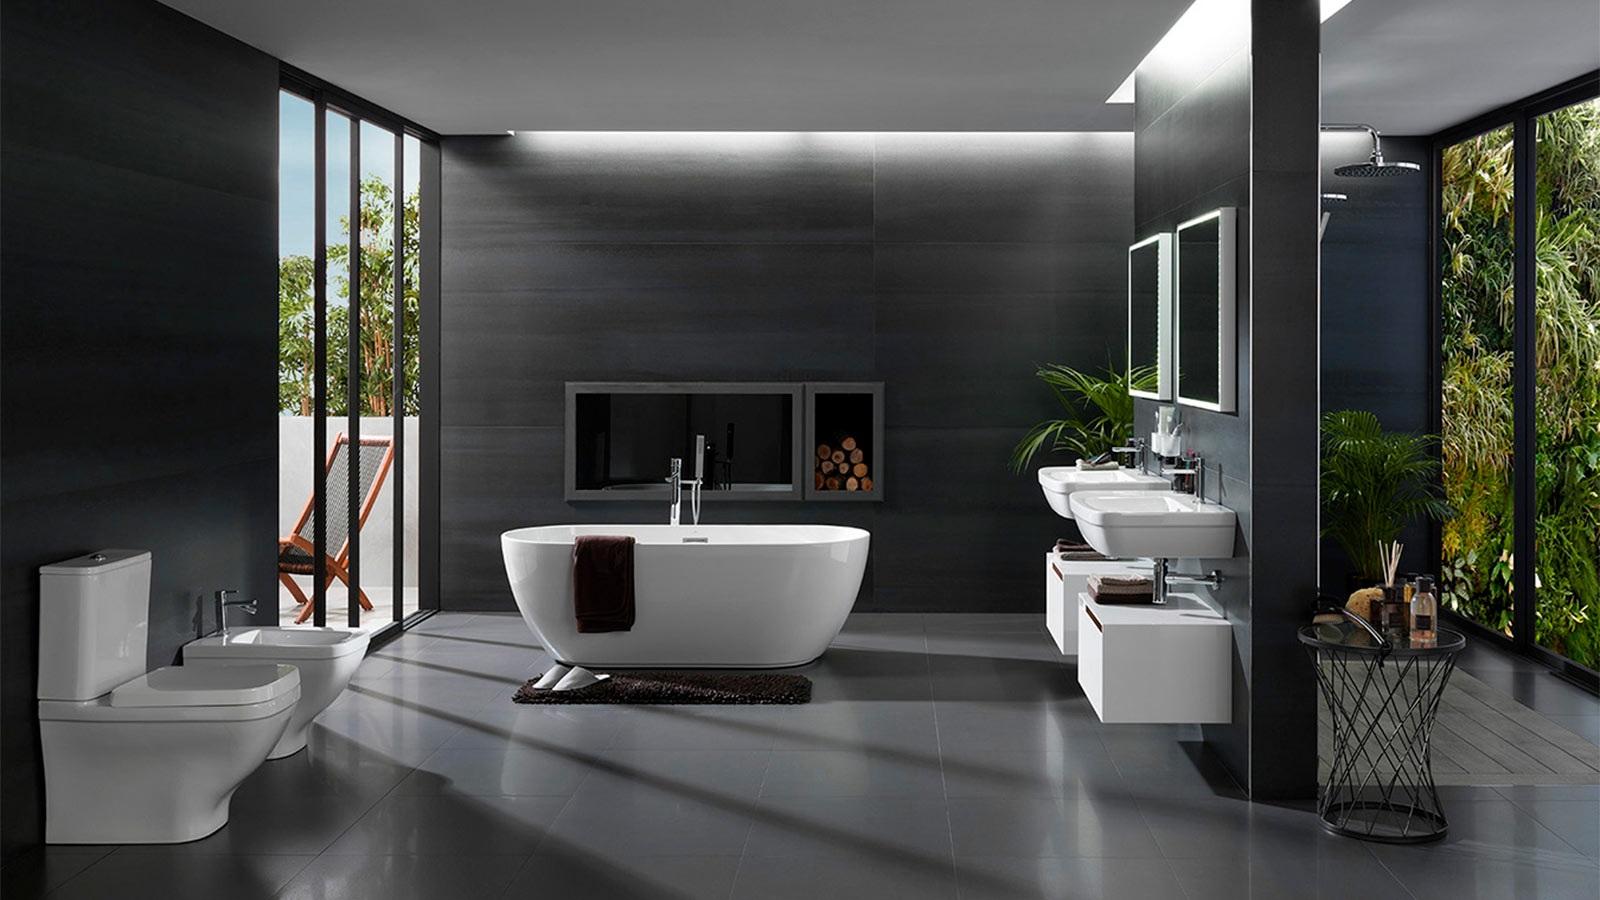 salle de bain les 10 tendances de